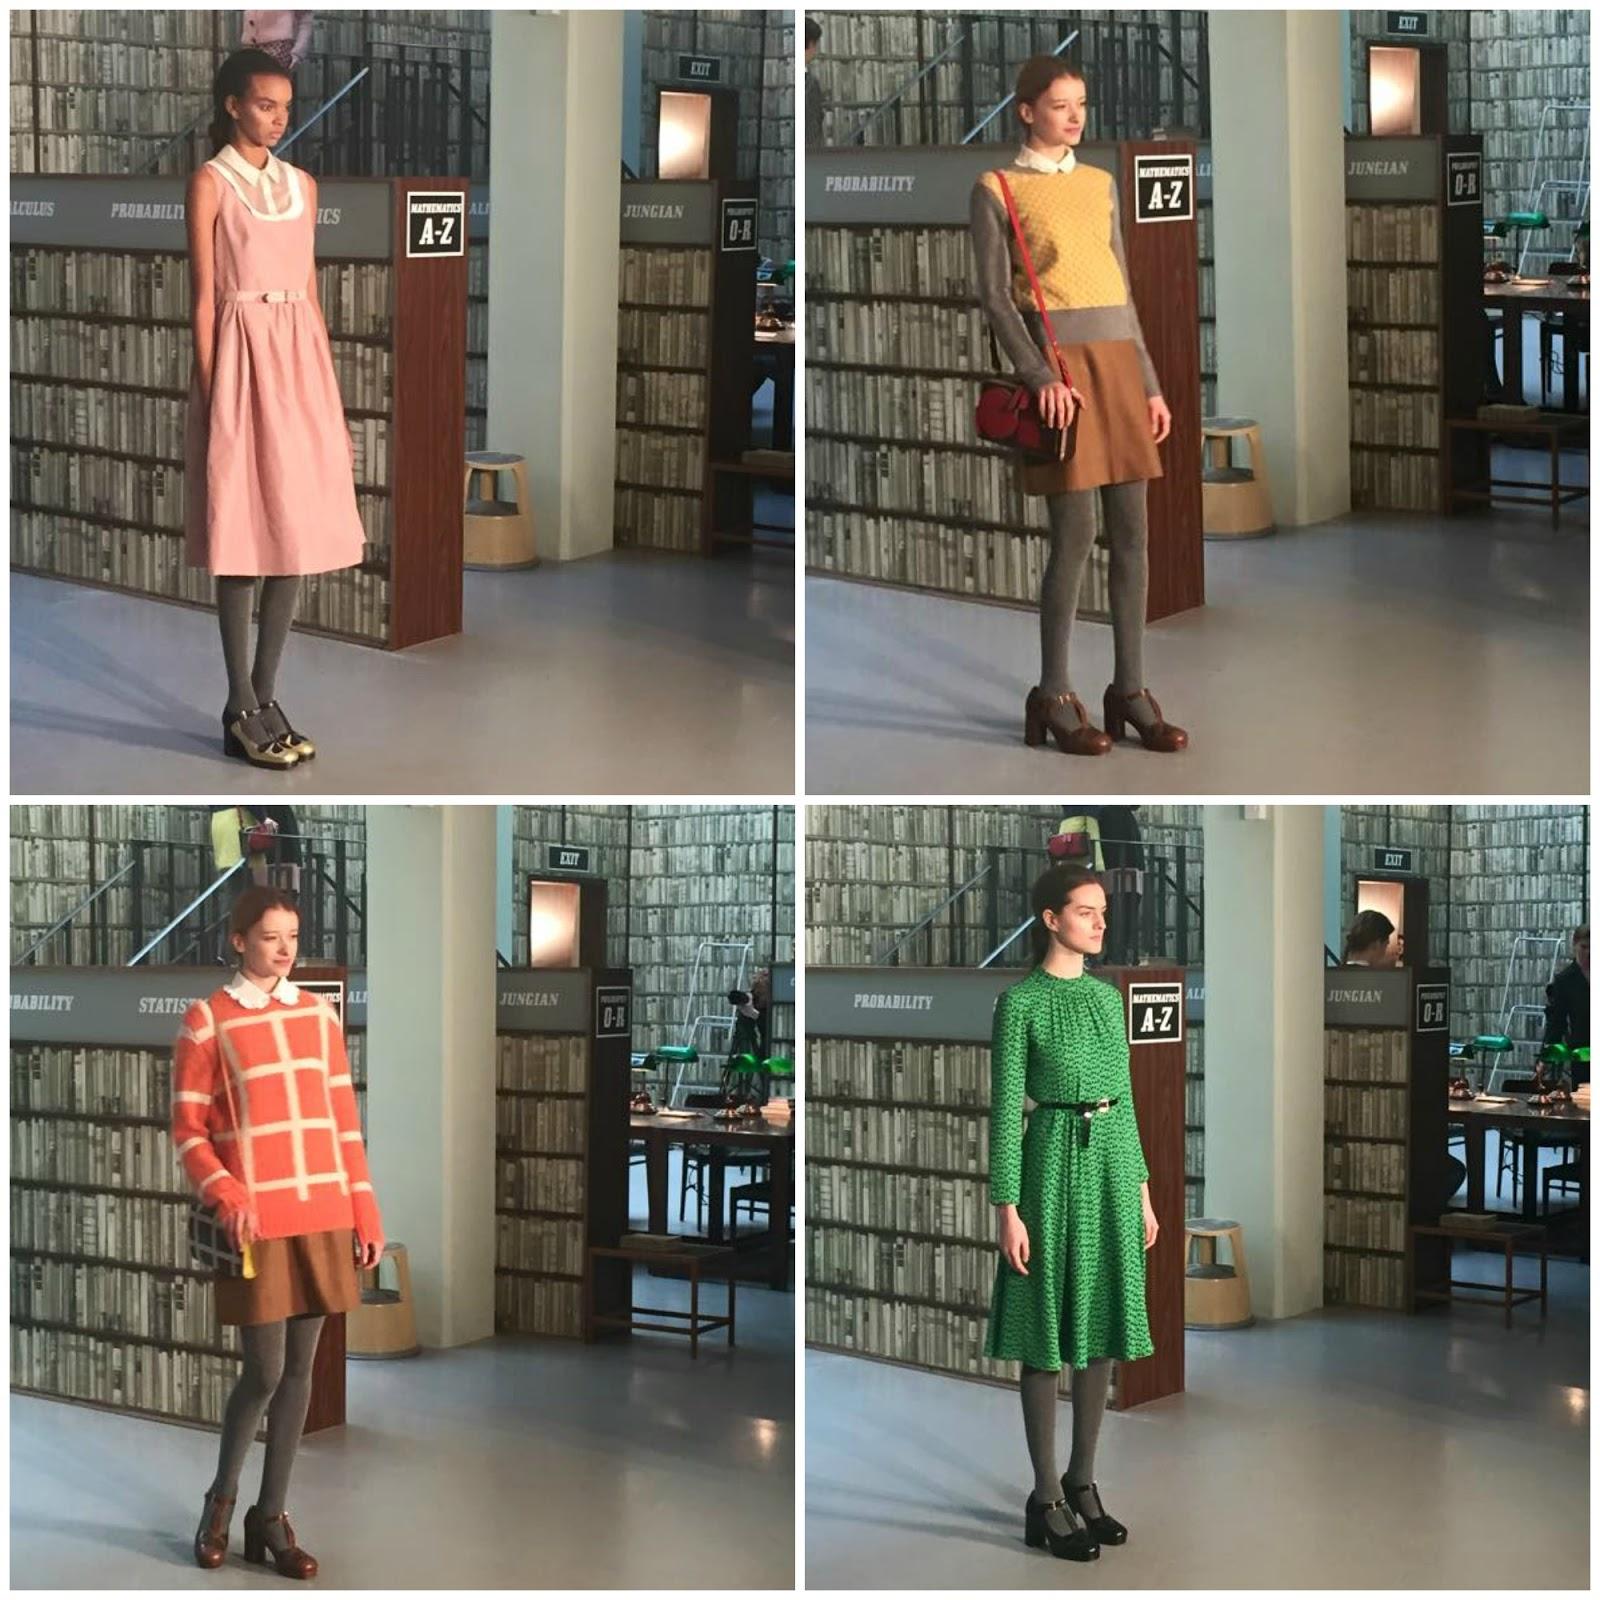 LFW AW15 Snapshots: Photo Diary, orla kiely, mode madeleine, fashion blogger, LFW, AW15, london fashion week, seventies, styling, catwalk, fashion week, felder felder, bora aksu, red hot sunglasses, sam faires, michelle keegan, rosie londoner